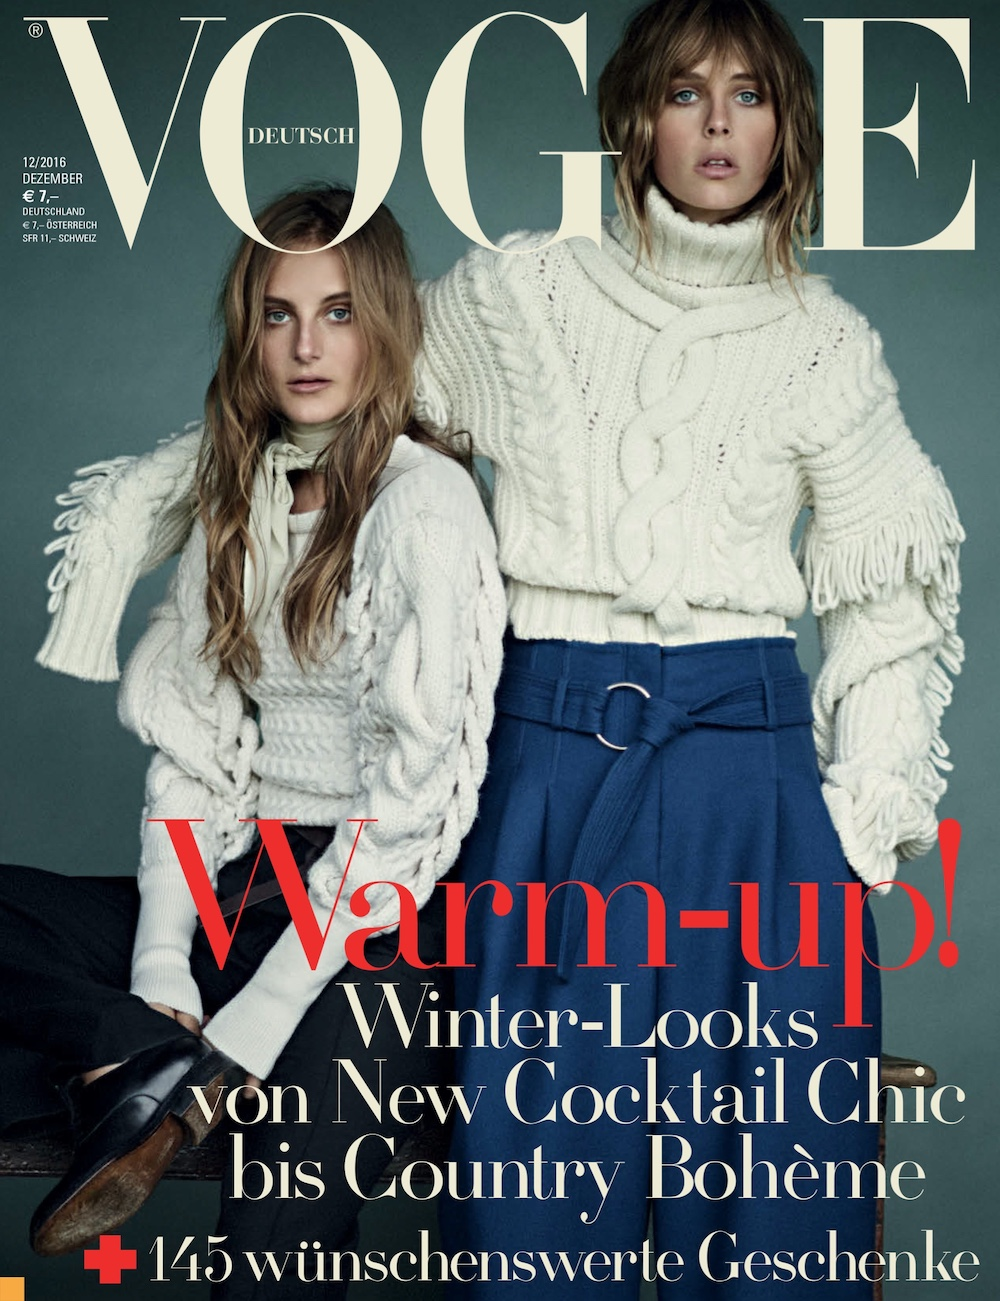 Vogue 2016-12